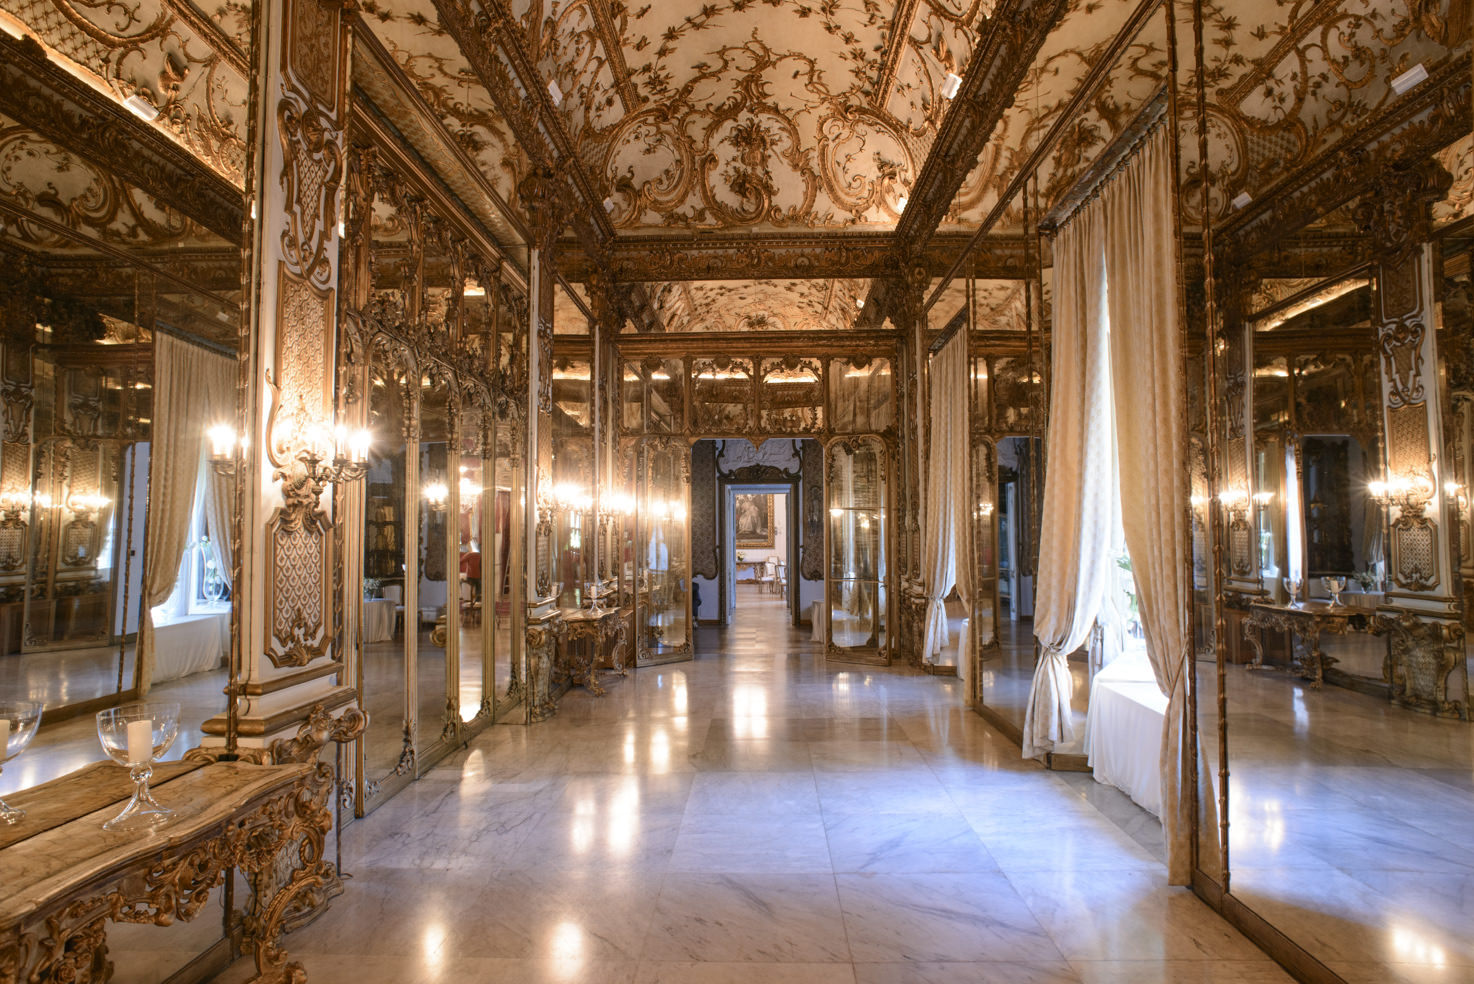 Baroque interior of Palazzo Brancaccio